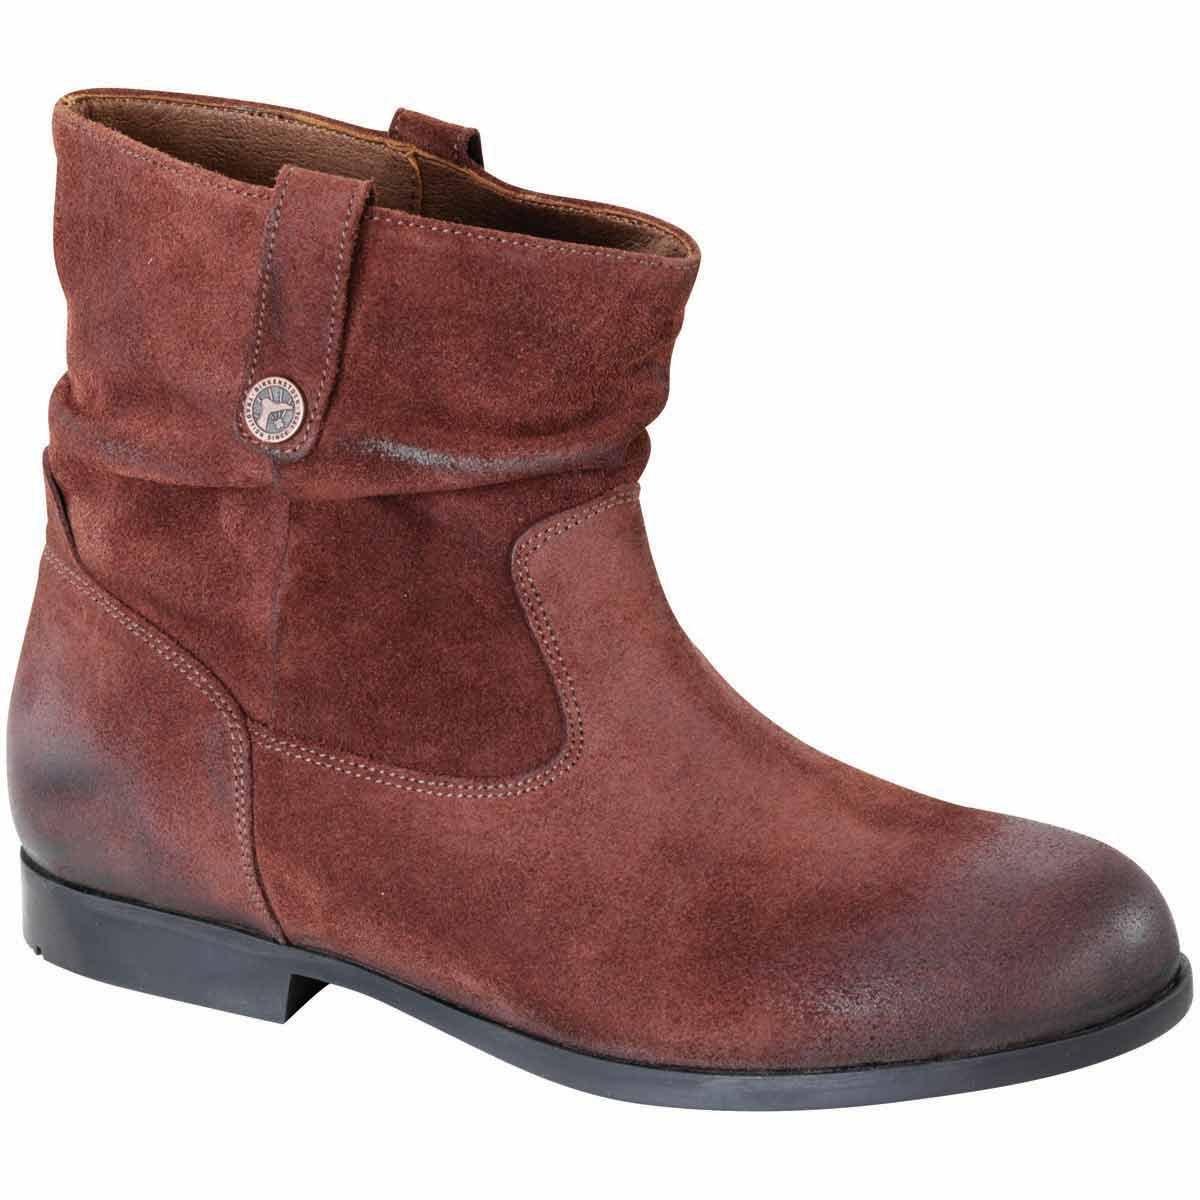 Birkenstock Women's Sarnia Boot Espresso Waxed Suede Size 41 M EU